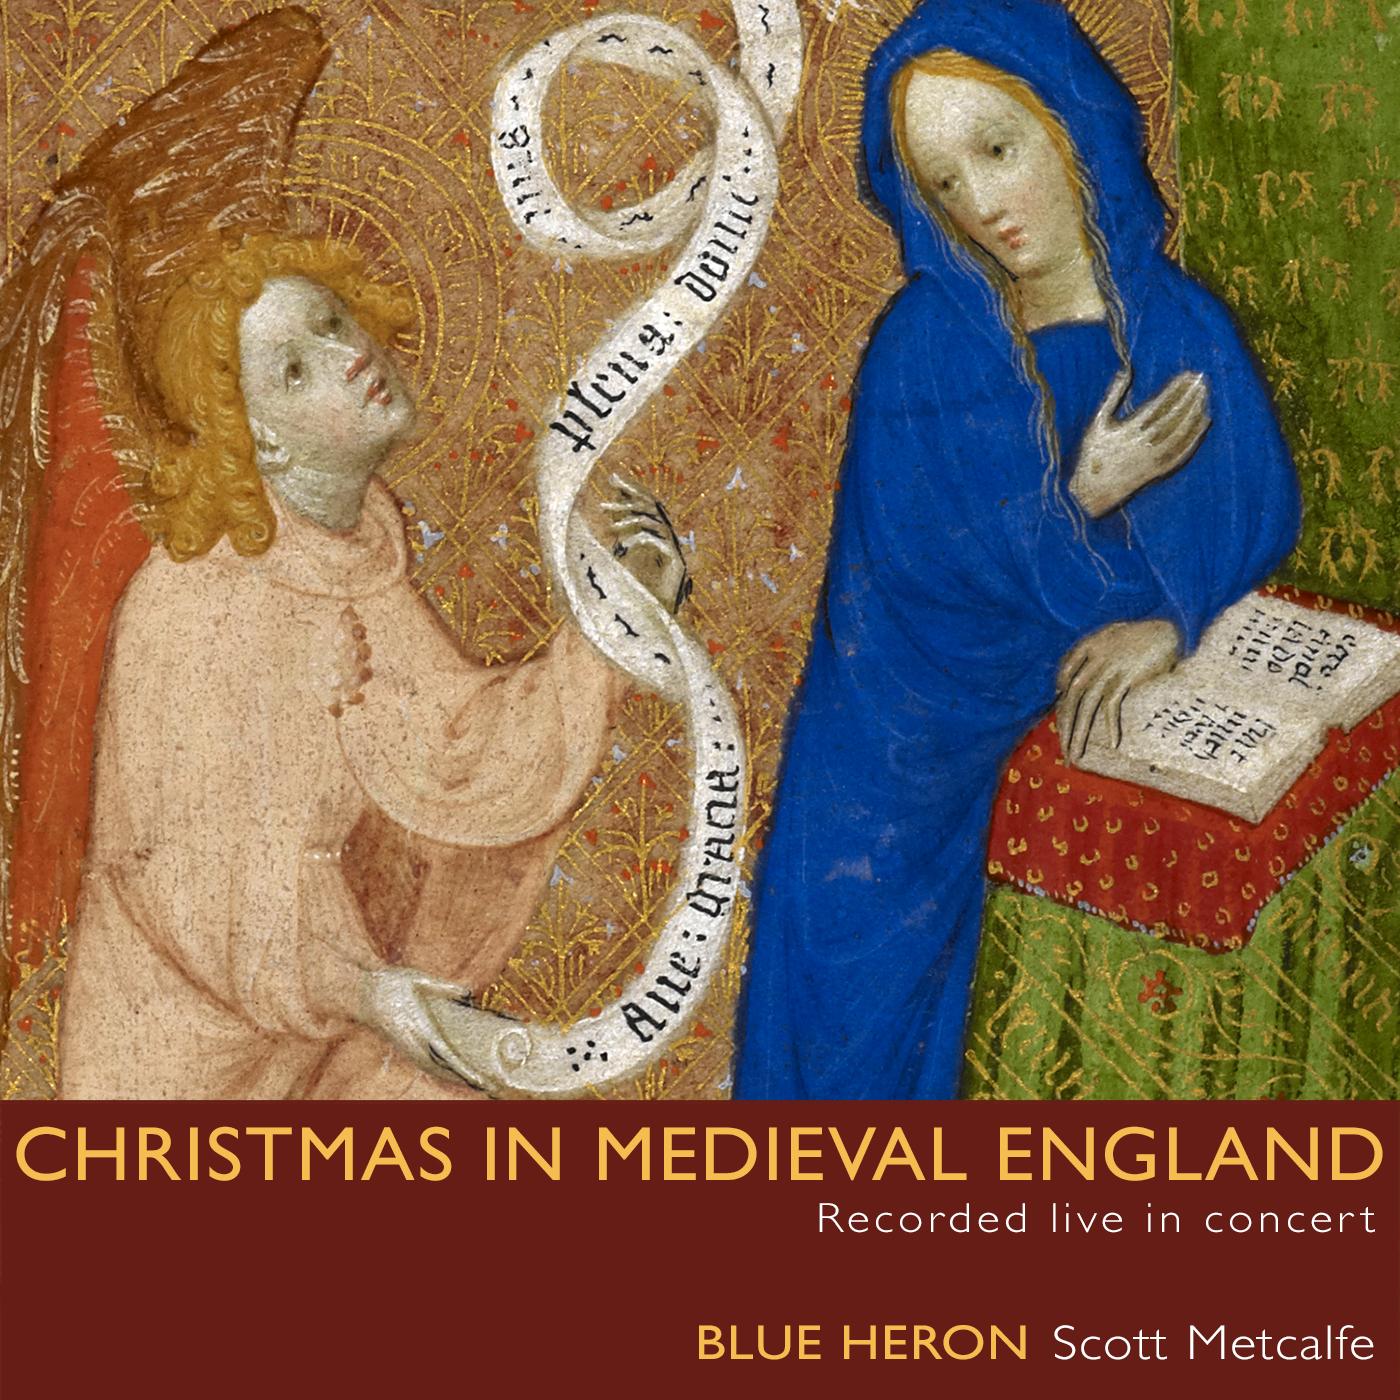 Blue Heron | Christmas in Medieval England